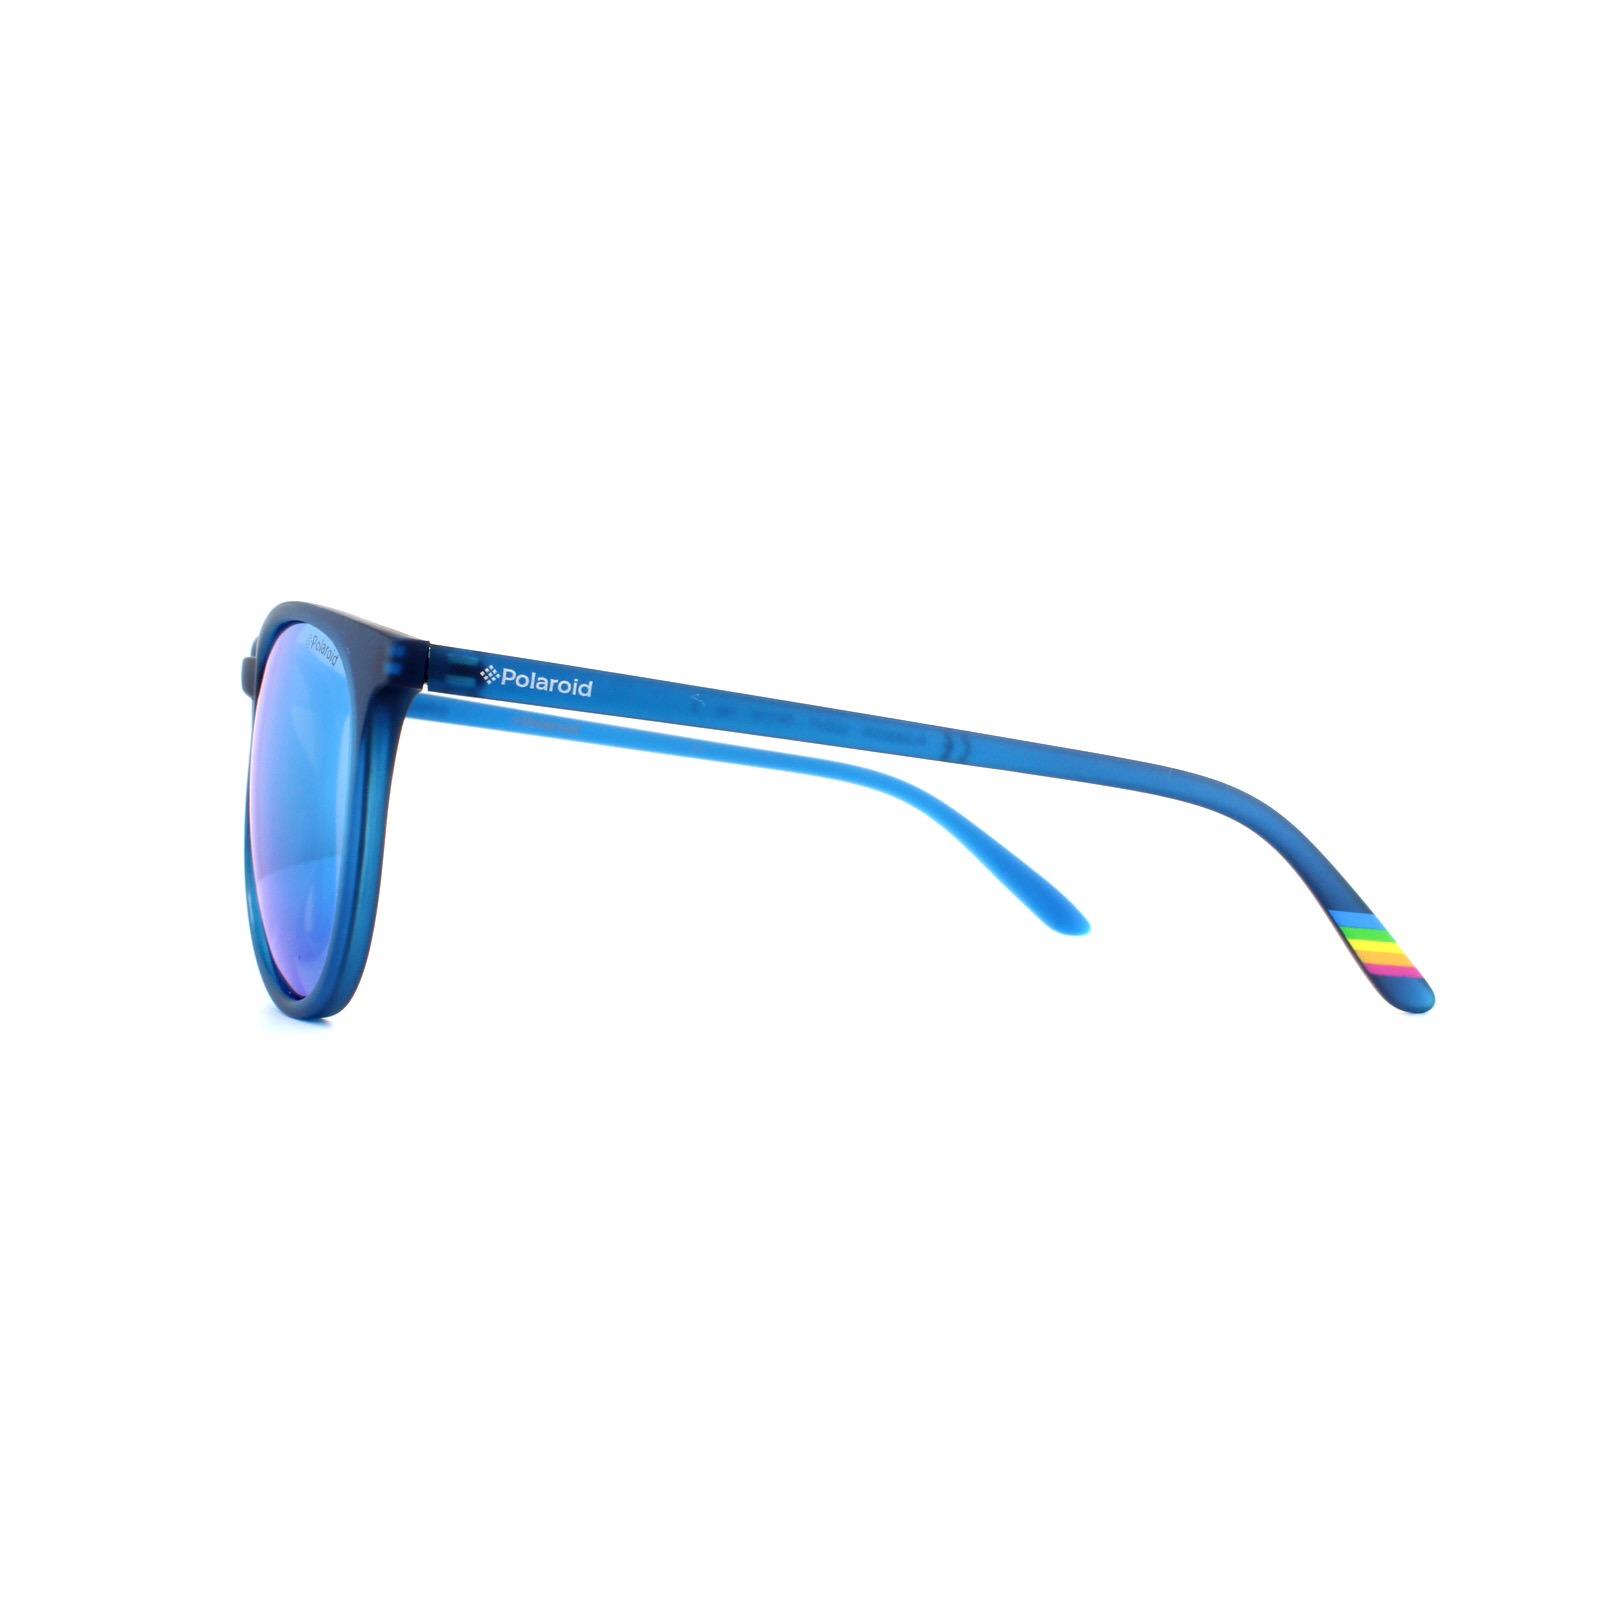 32549e2b9a CENTINELA Gafas de sol polaroid PLD 6003/N JY UJO espejo azul azul  polarizado